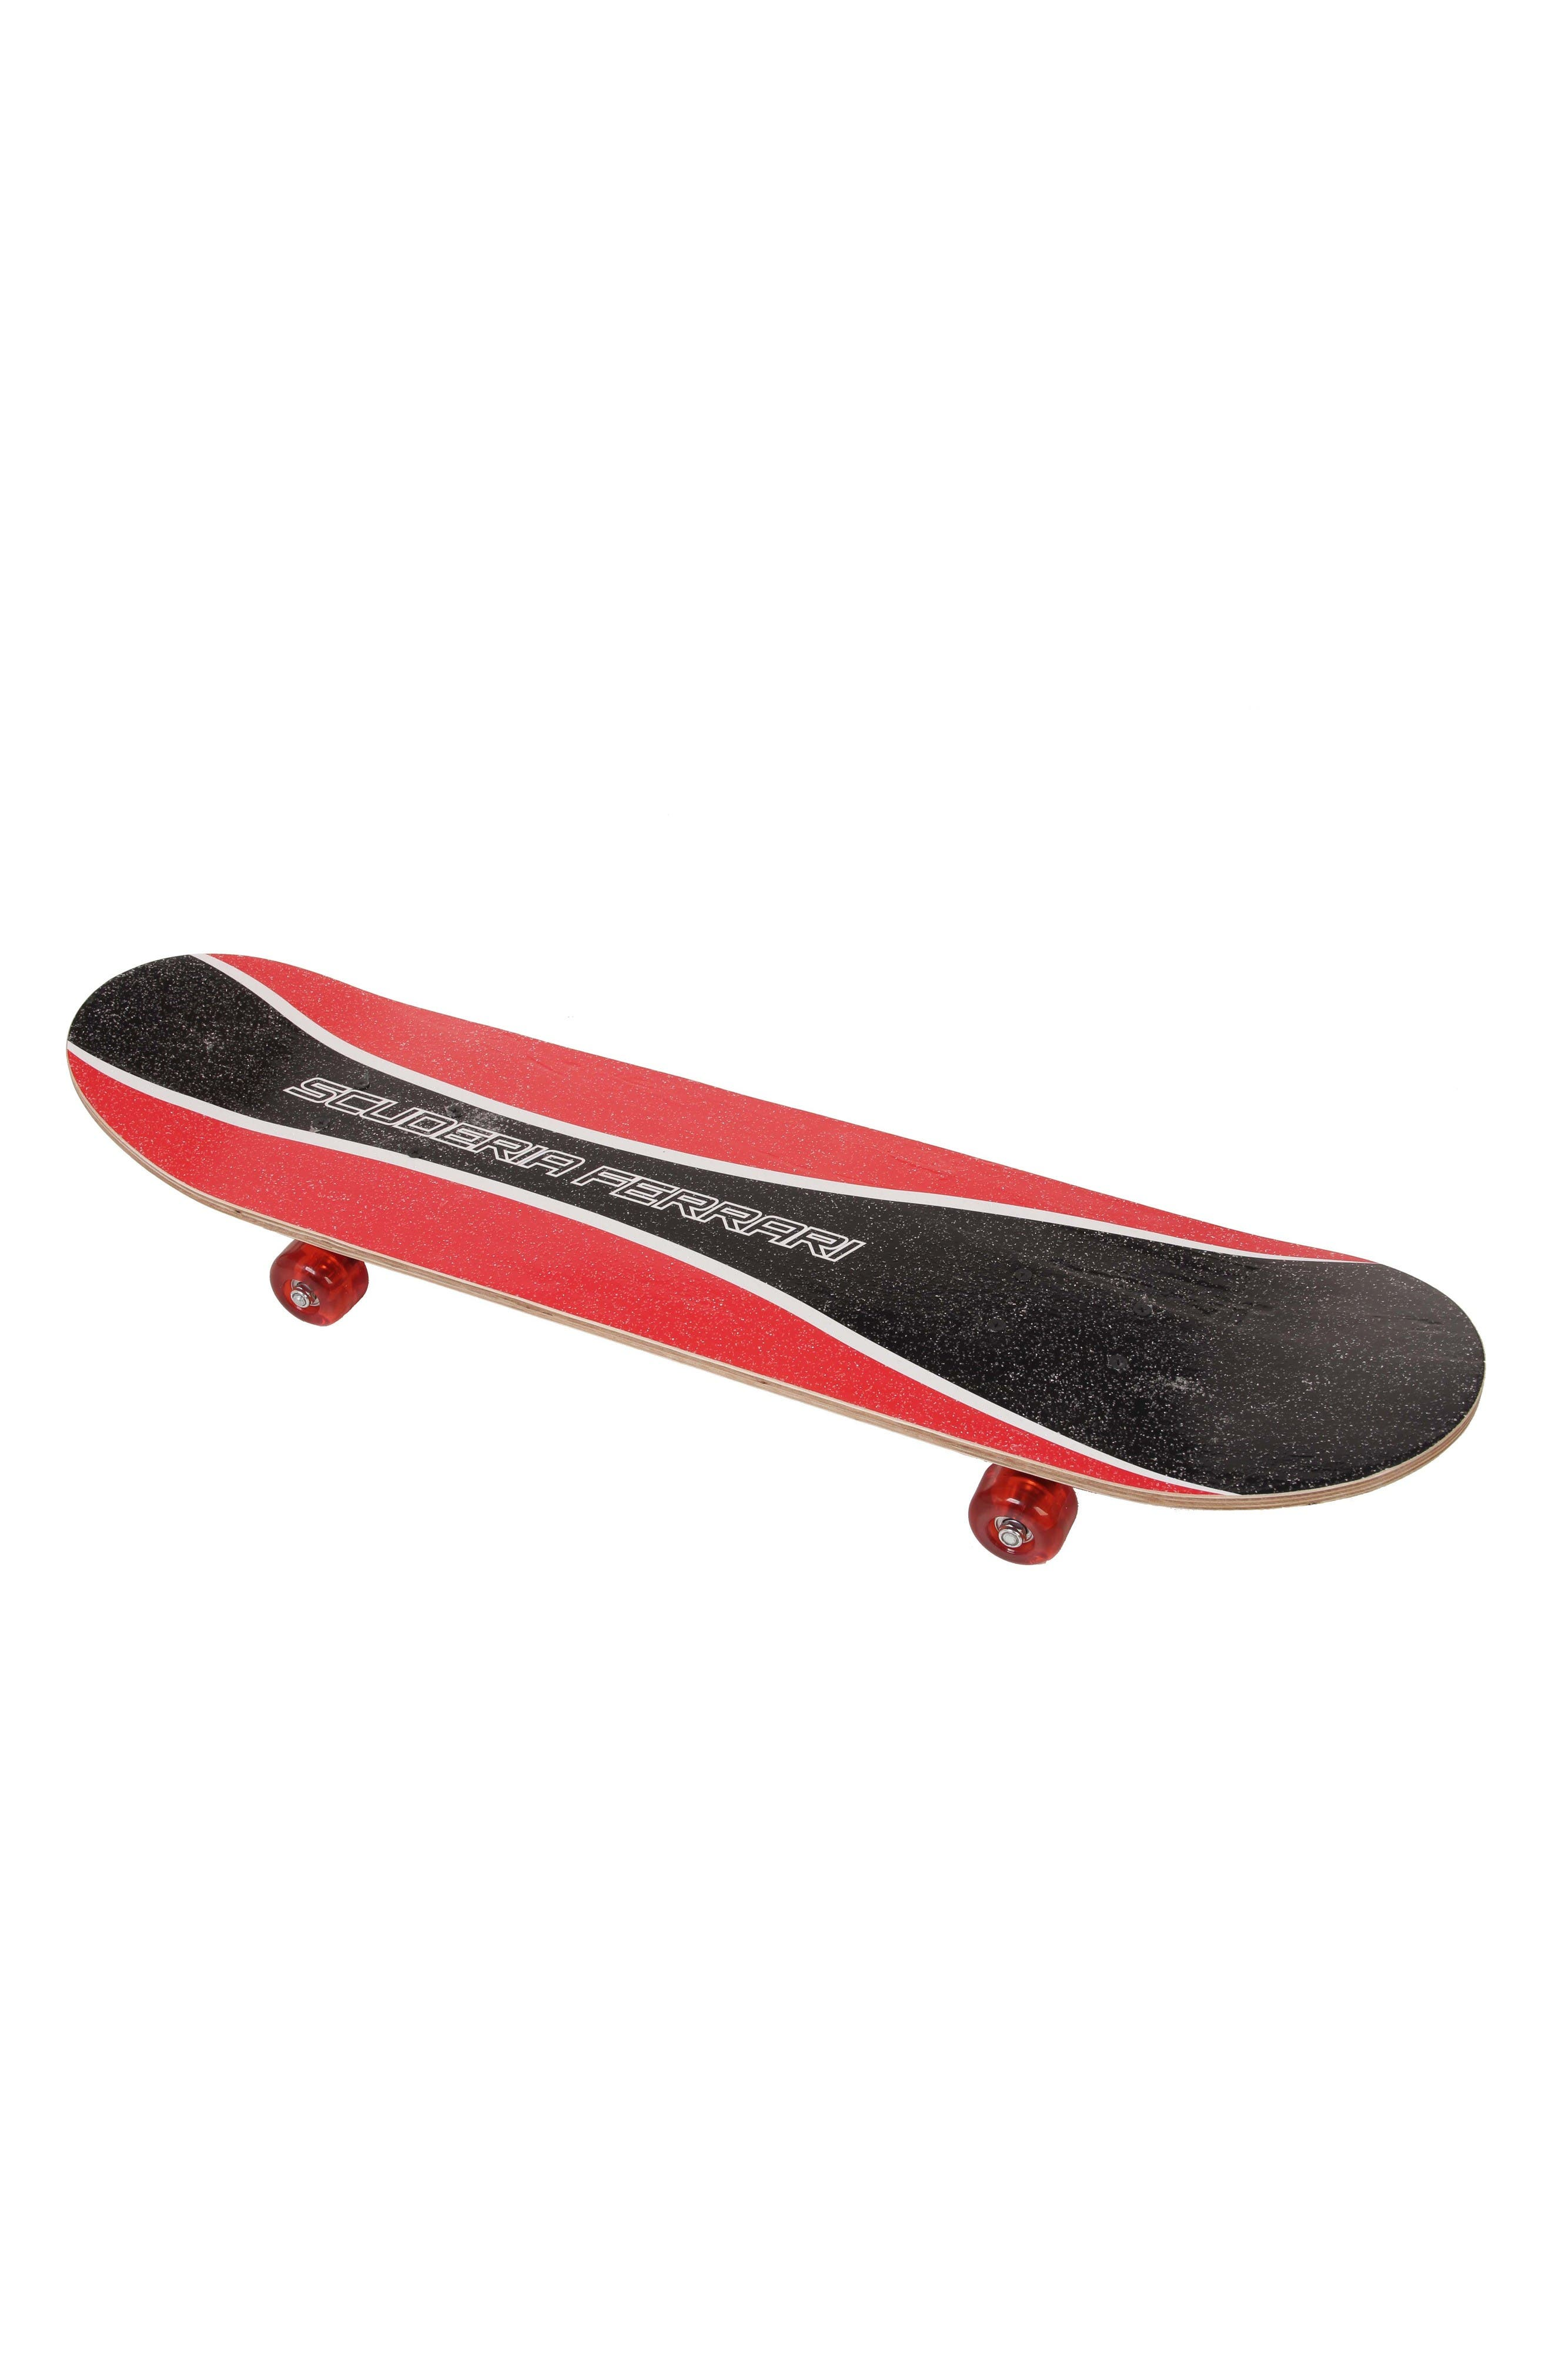 Main Image - Ferrari Double Kick Skateboard